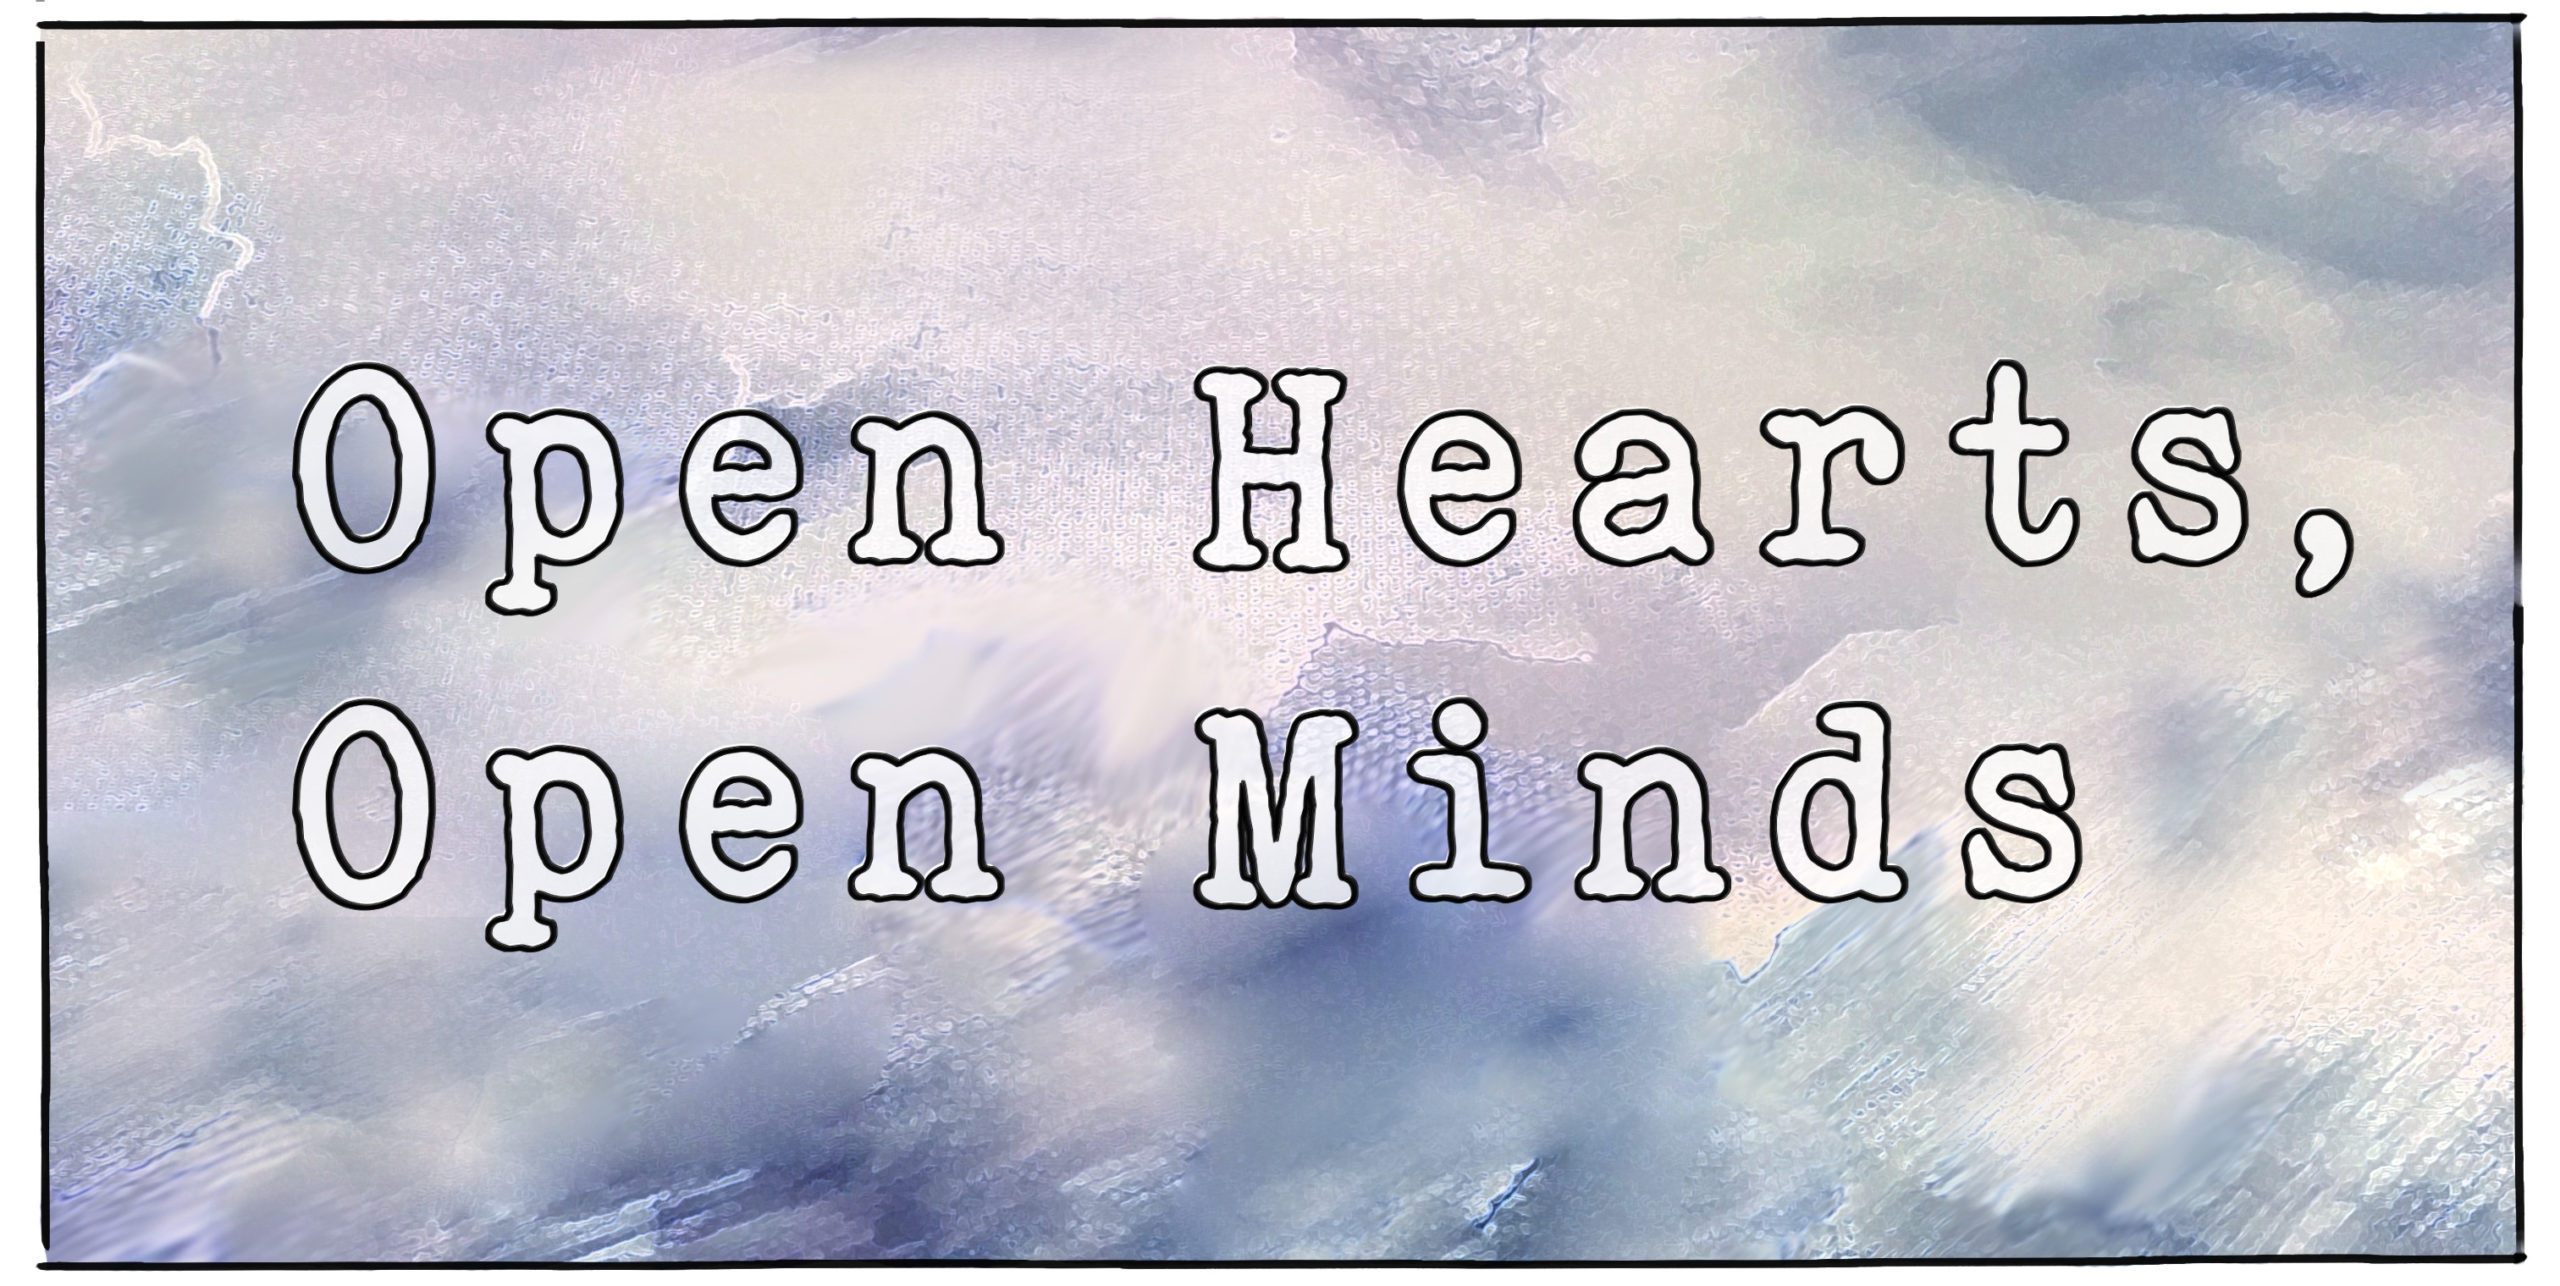 openhearts2